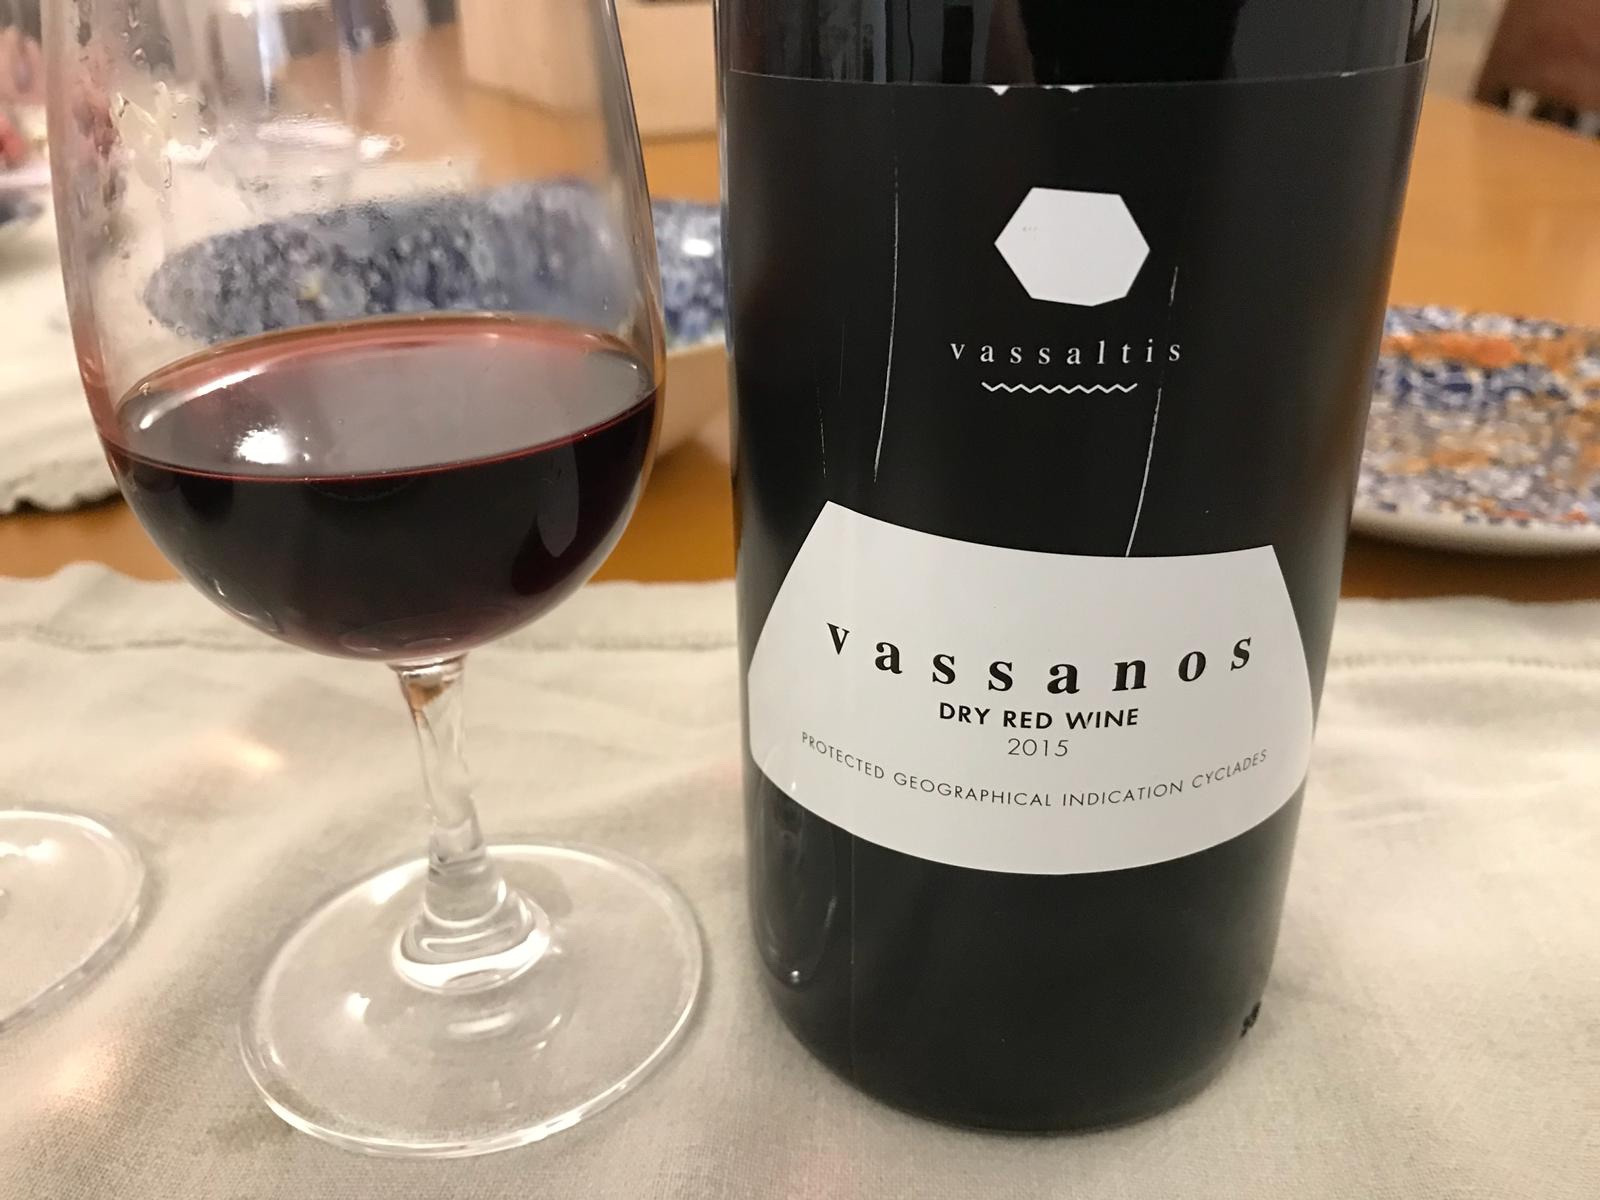 Vassaltis Winery - Vassanos Dry Red Wine, Santorini 2015